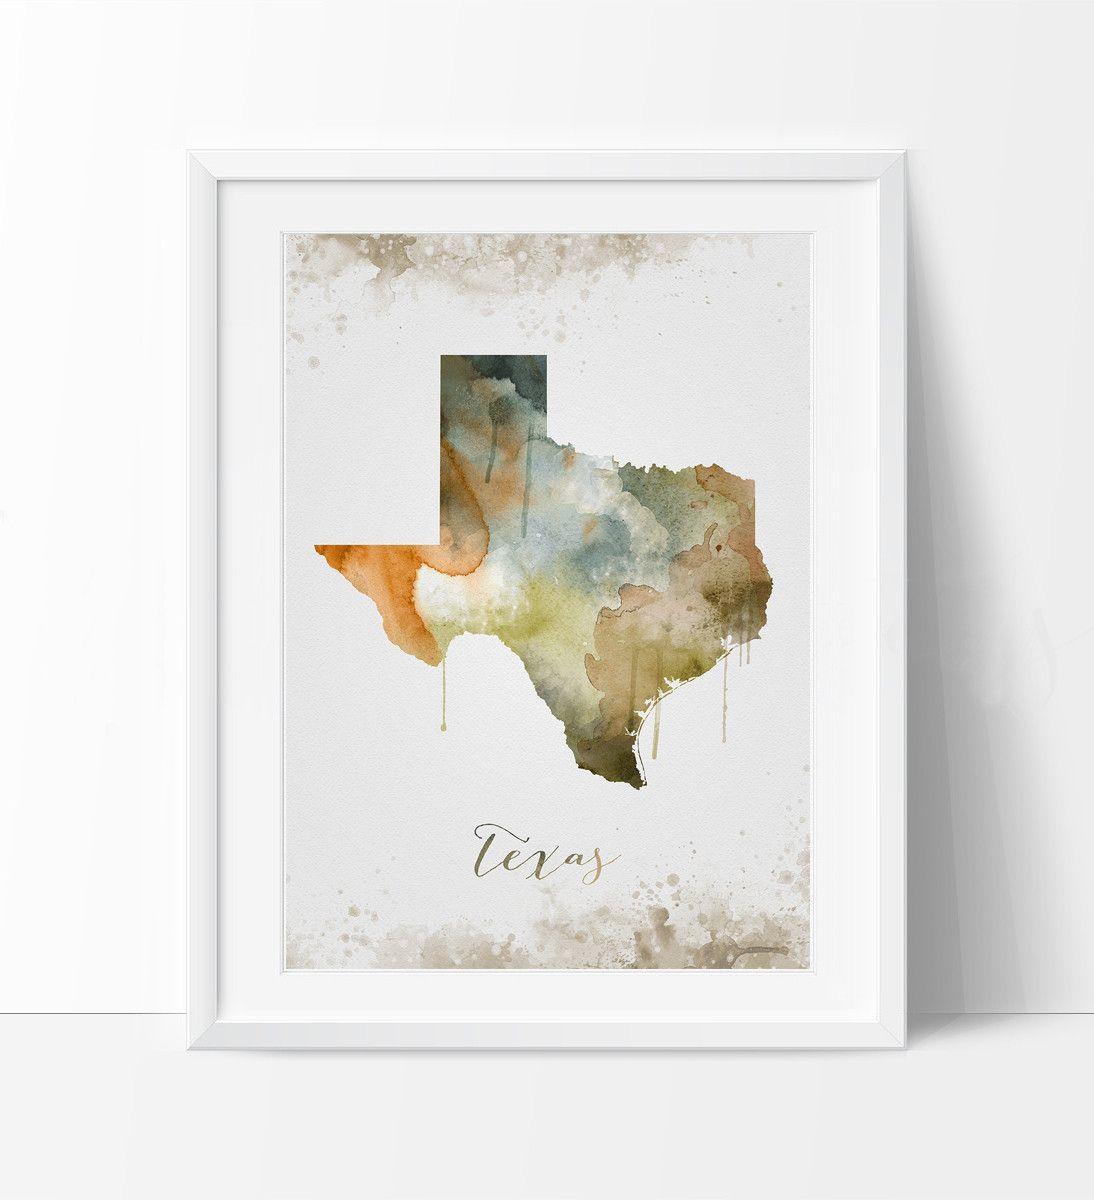 Texas Wall Art Art Print Texas Decor Texas Map Art Watercolor State Watercolor Texas Print Artwork 287 Texas Wall Art Texas Map Art Map Art